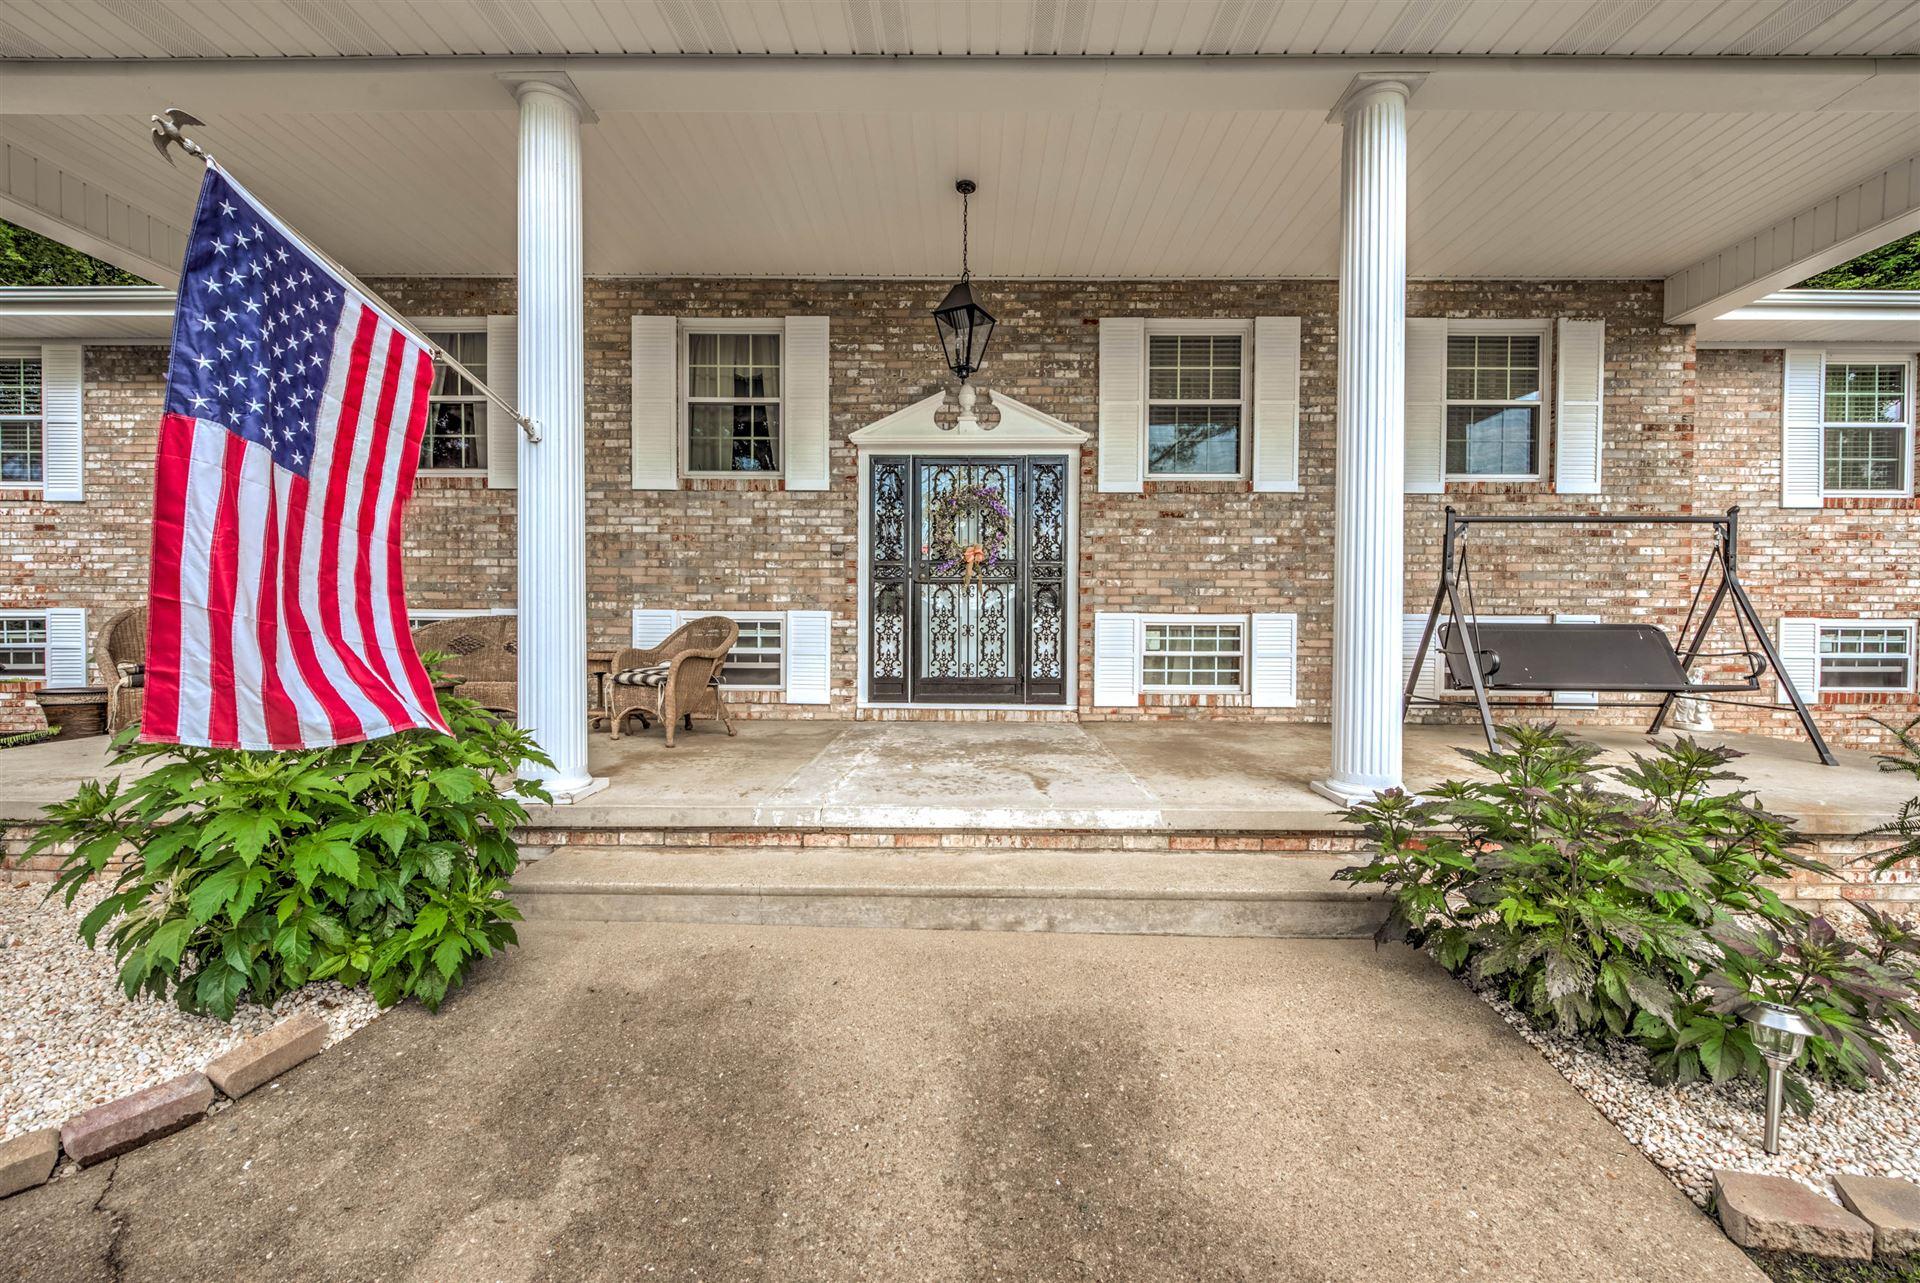 Photo of 334 Clinch Ave, Clinton, TN 37716 (MLS # 1119241)